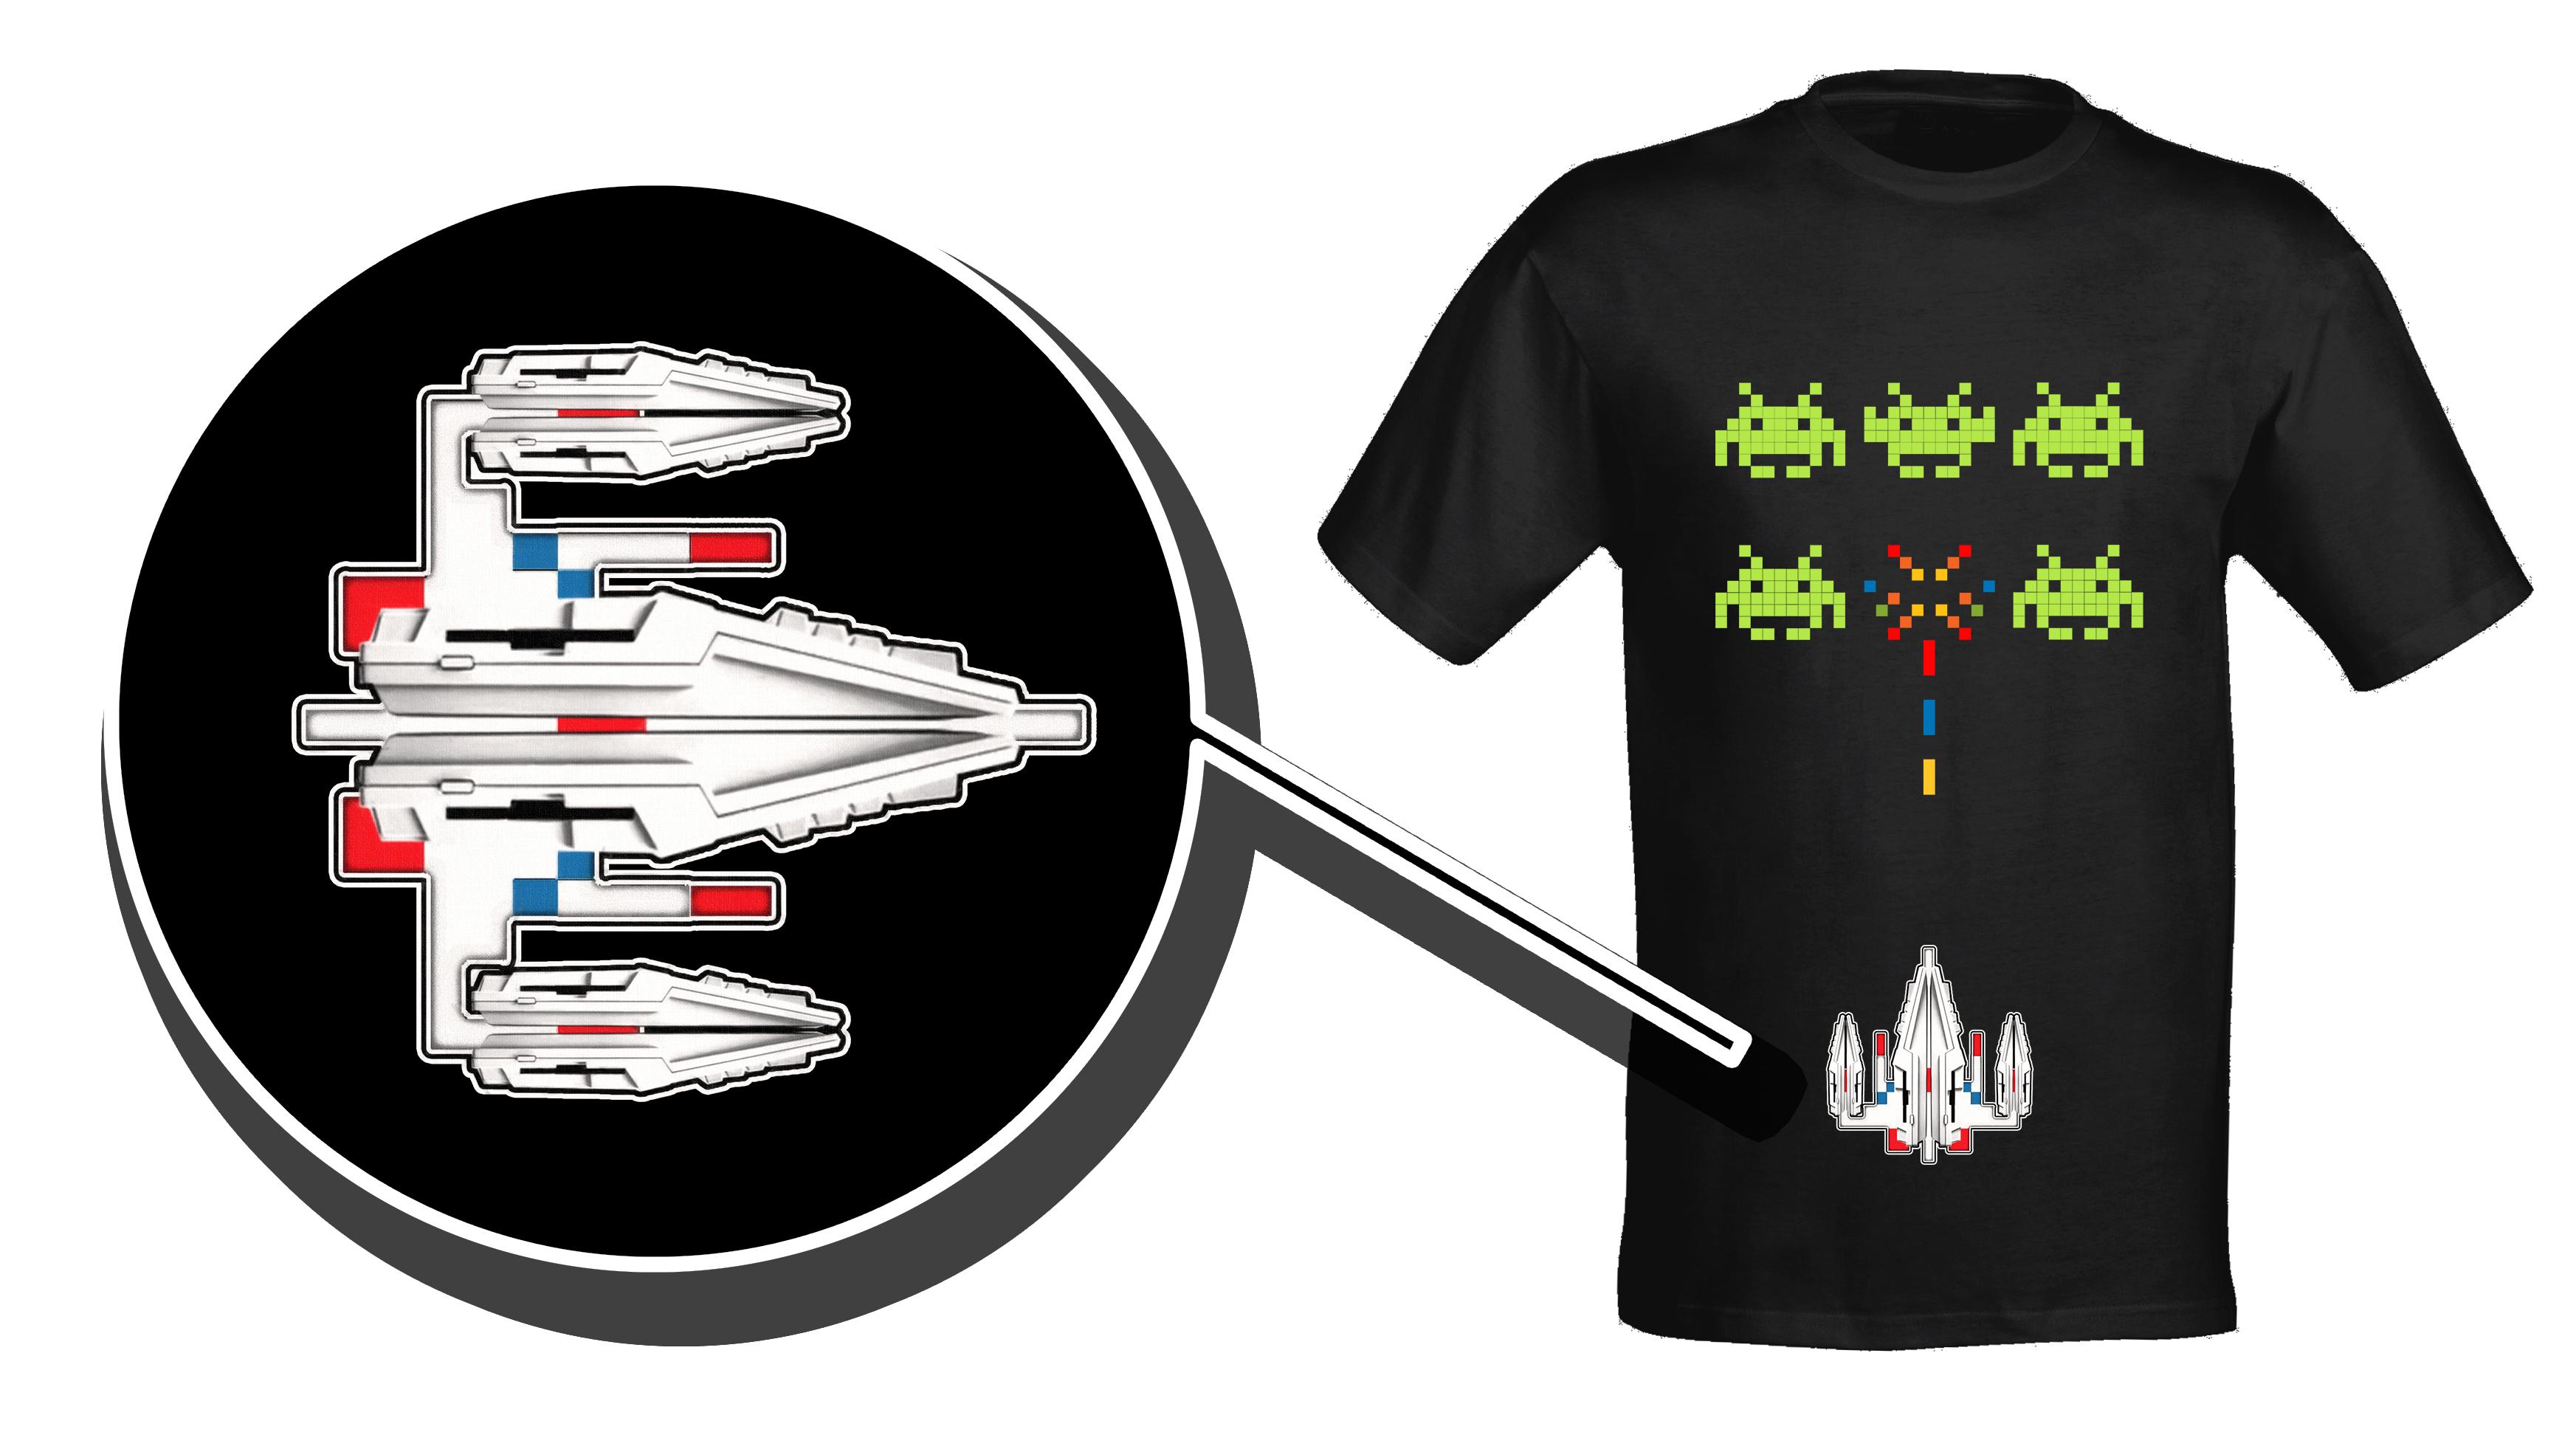 Amiga Vs Space Invaders T Shirt